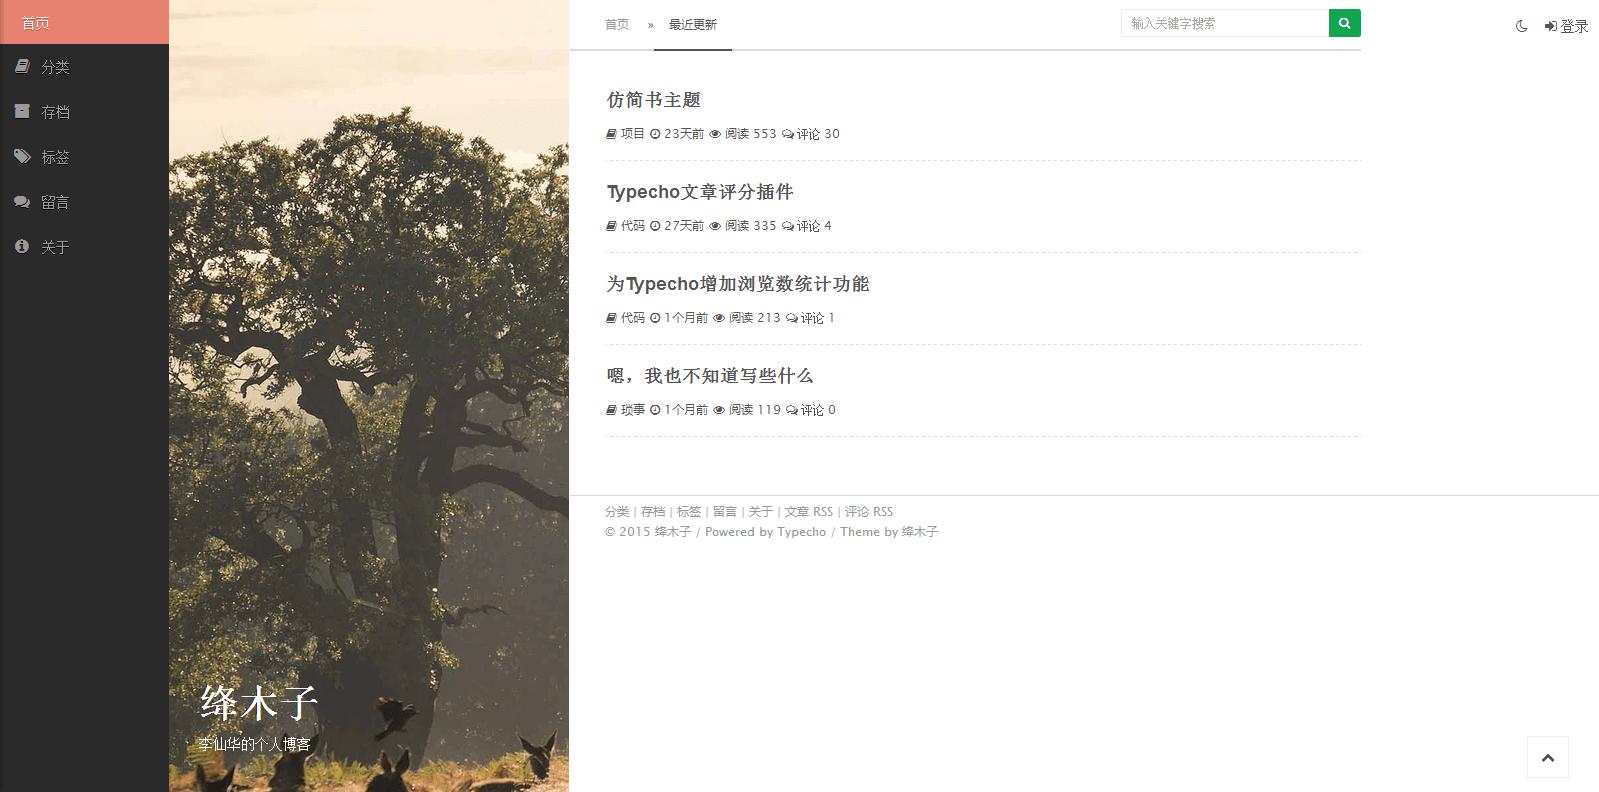 Typecho 仿简书响应式博客主题 jianshu